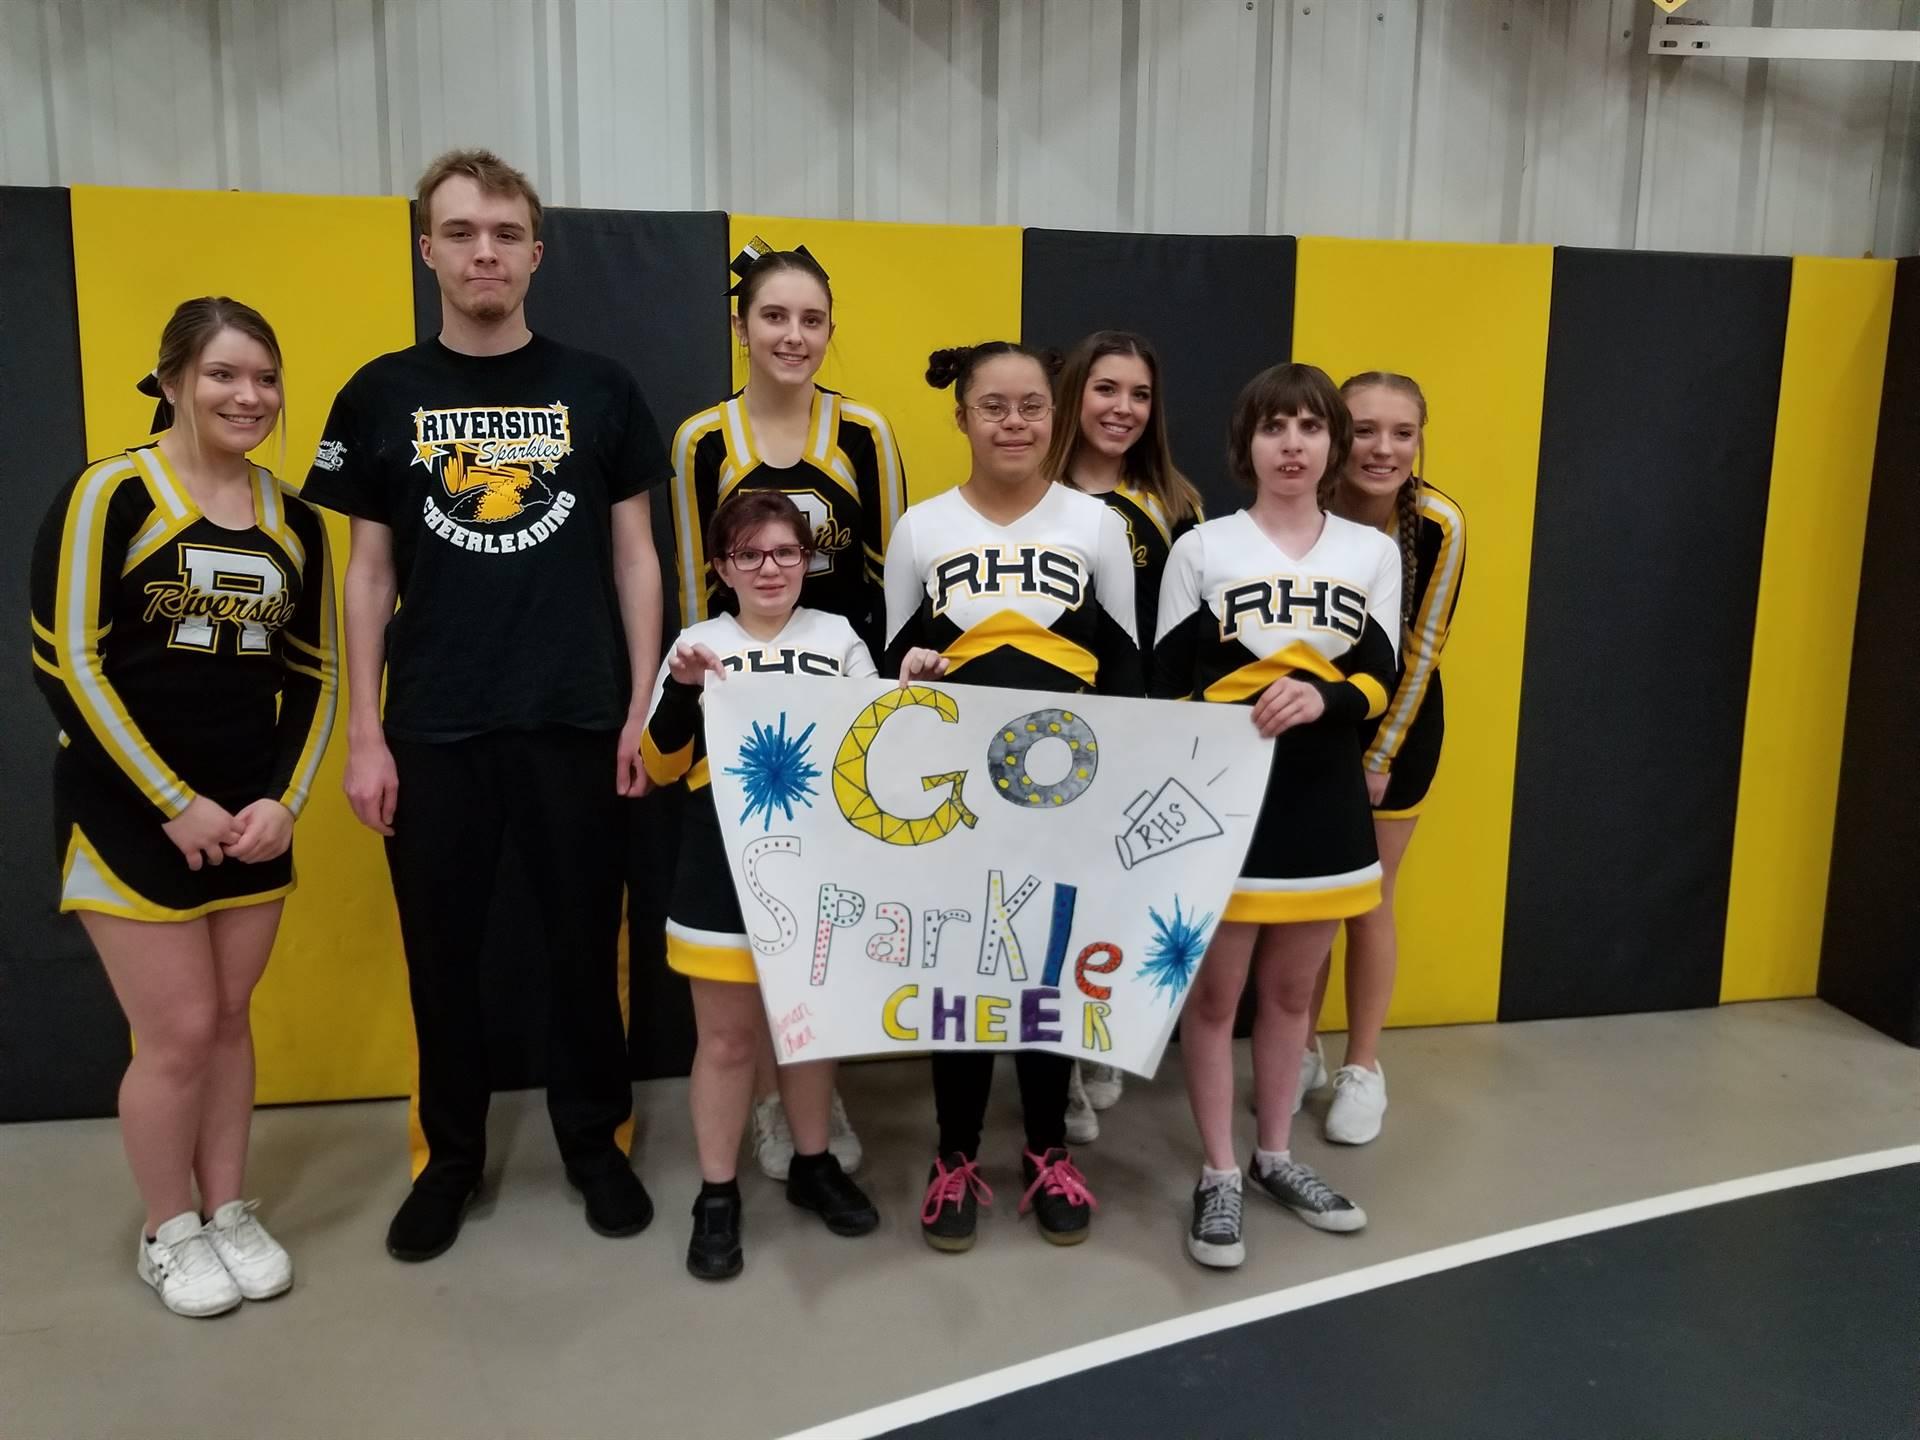 Sparkles Cheer Squad